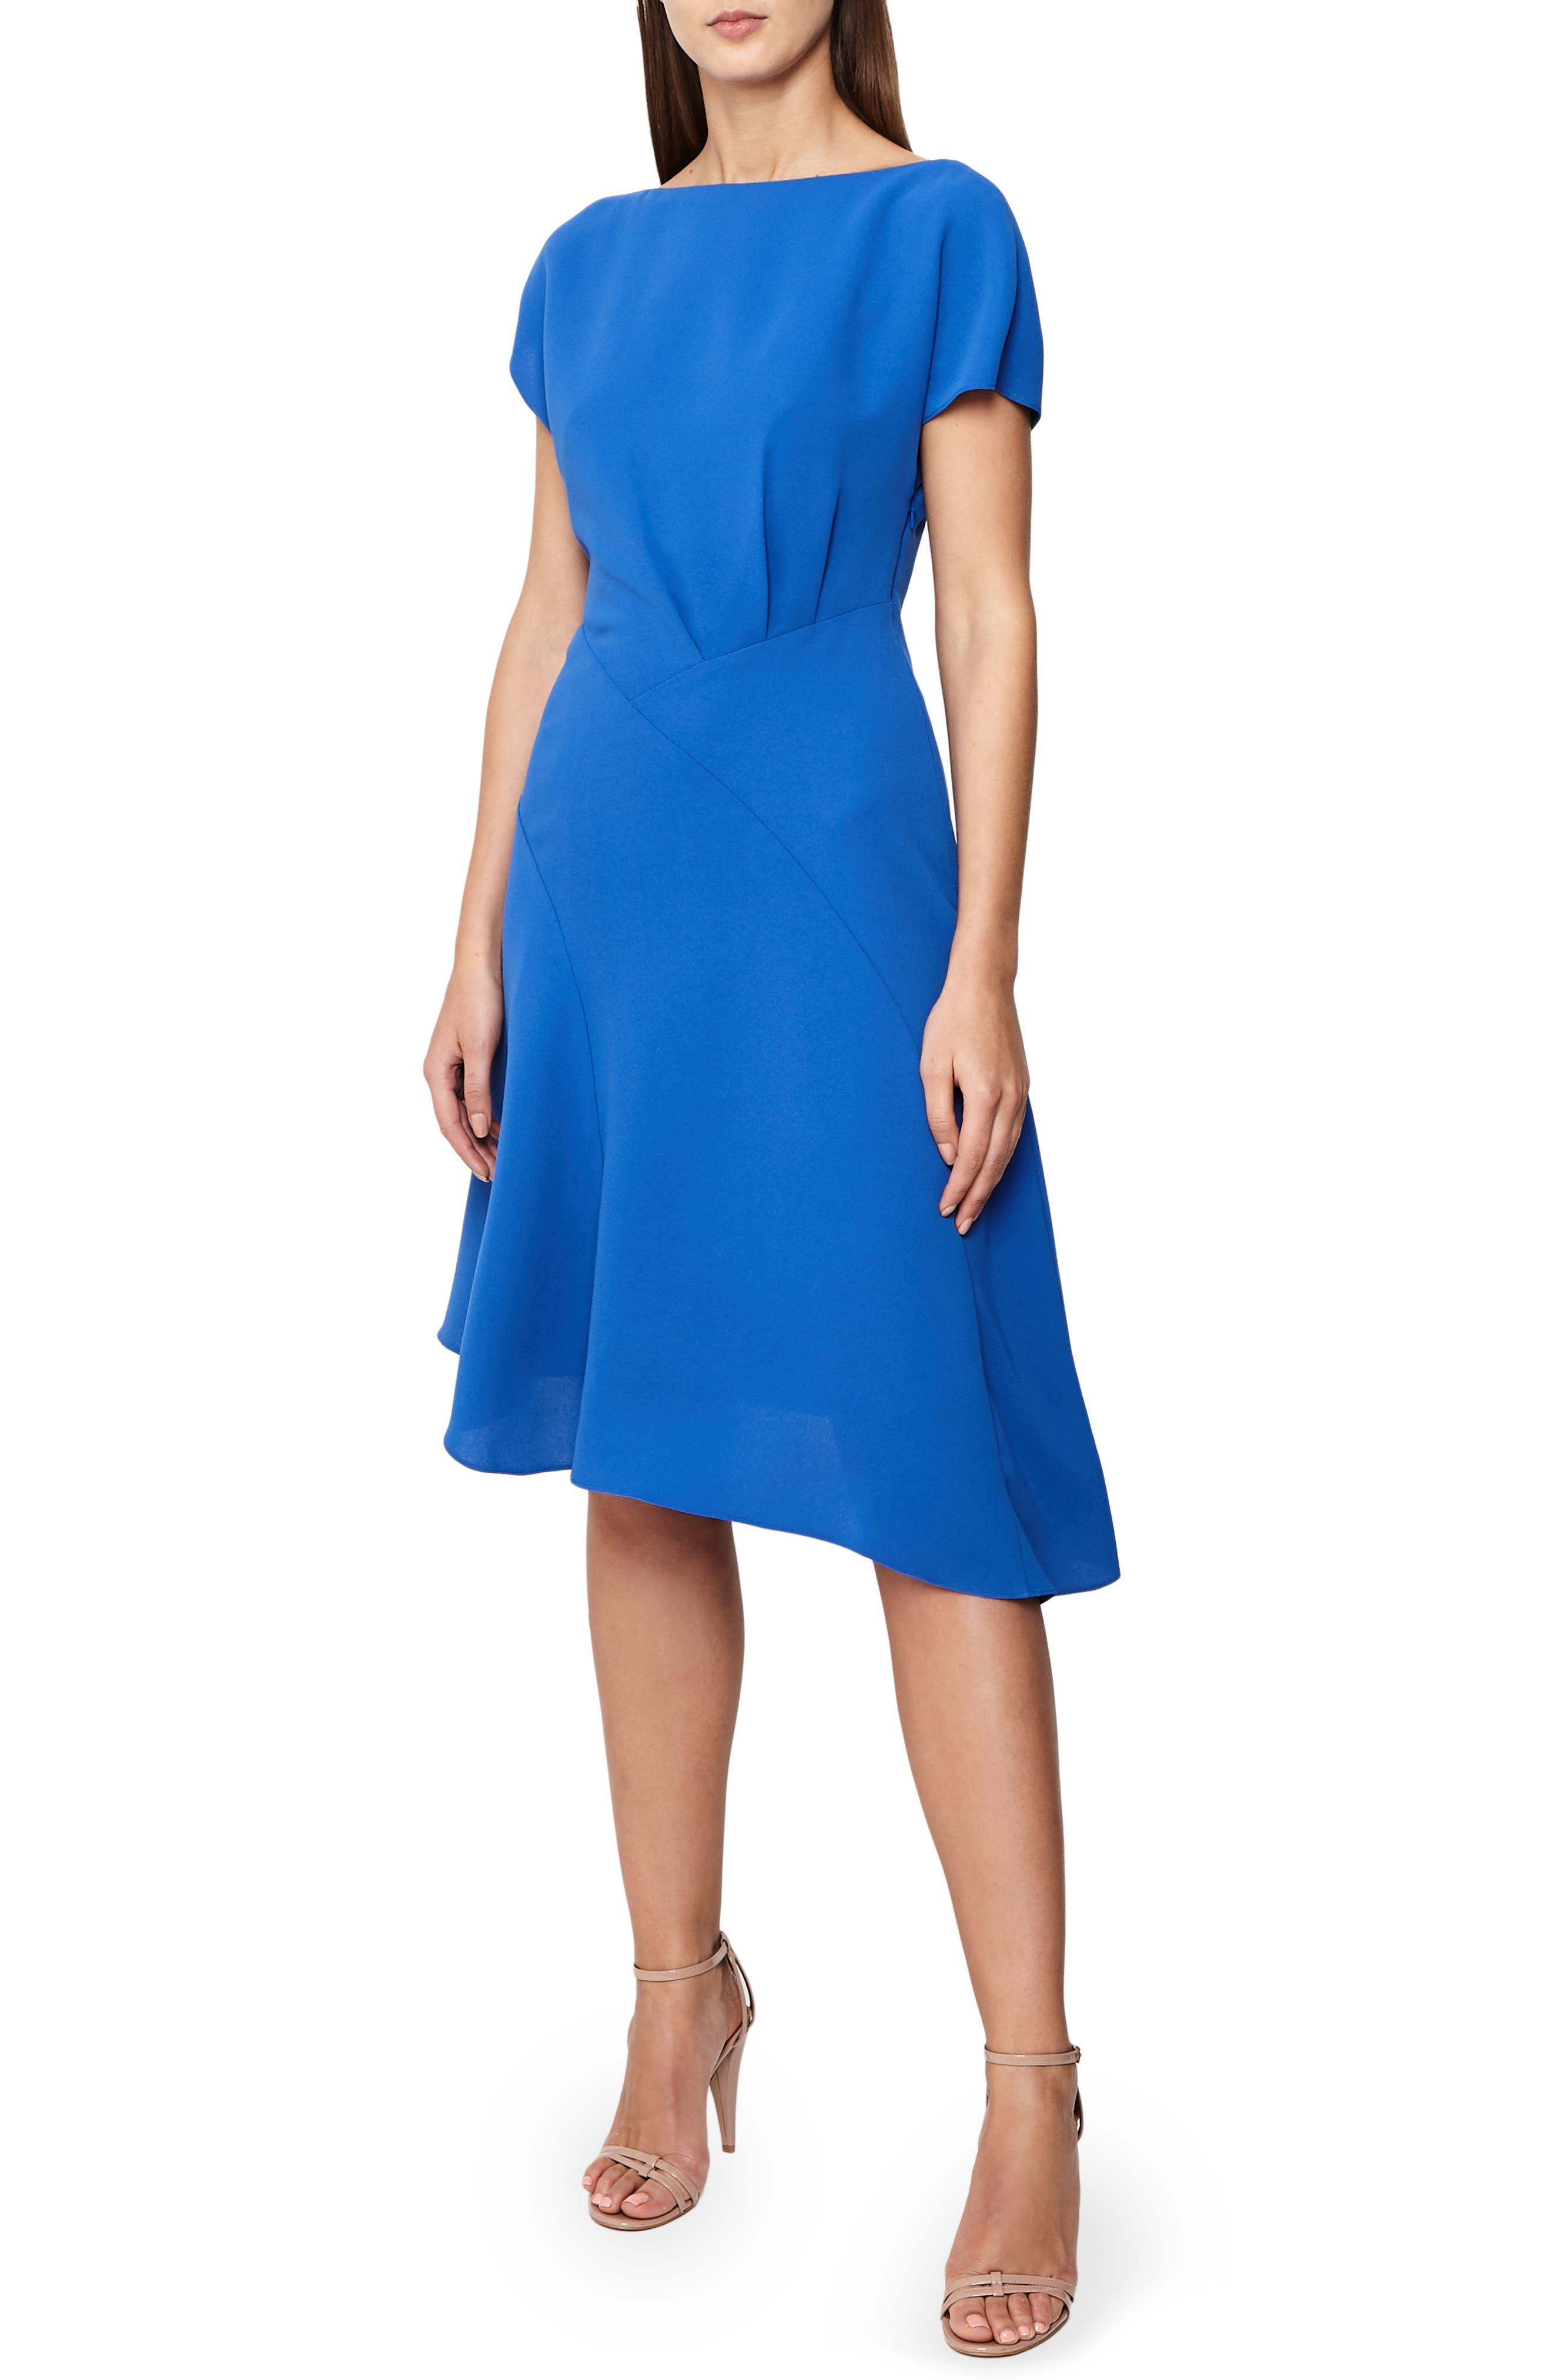 Reiss Dresses